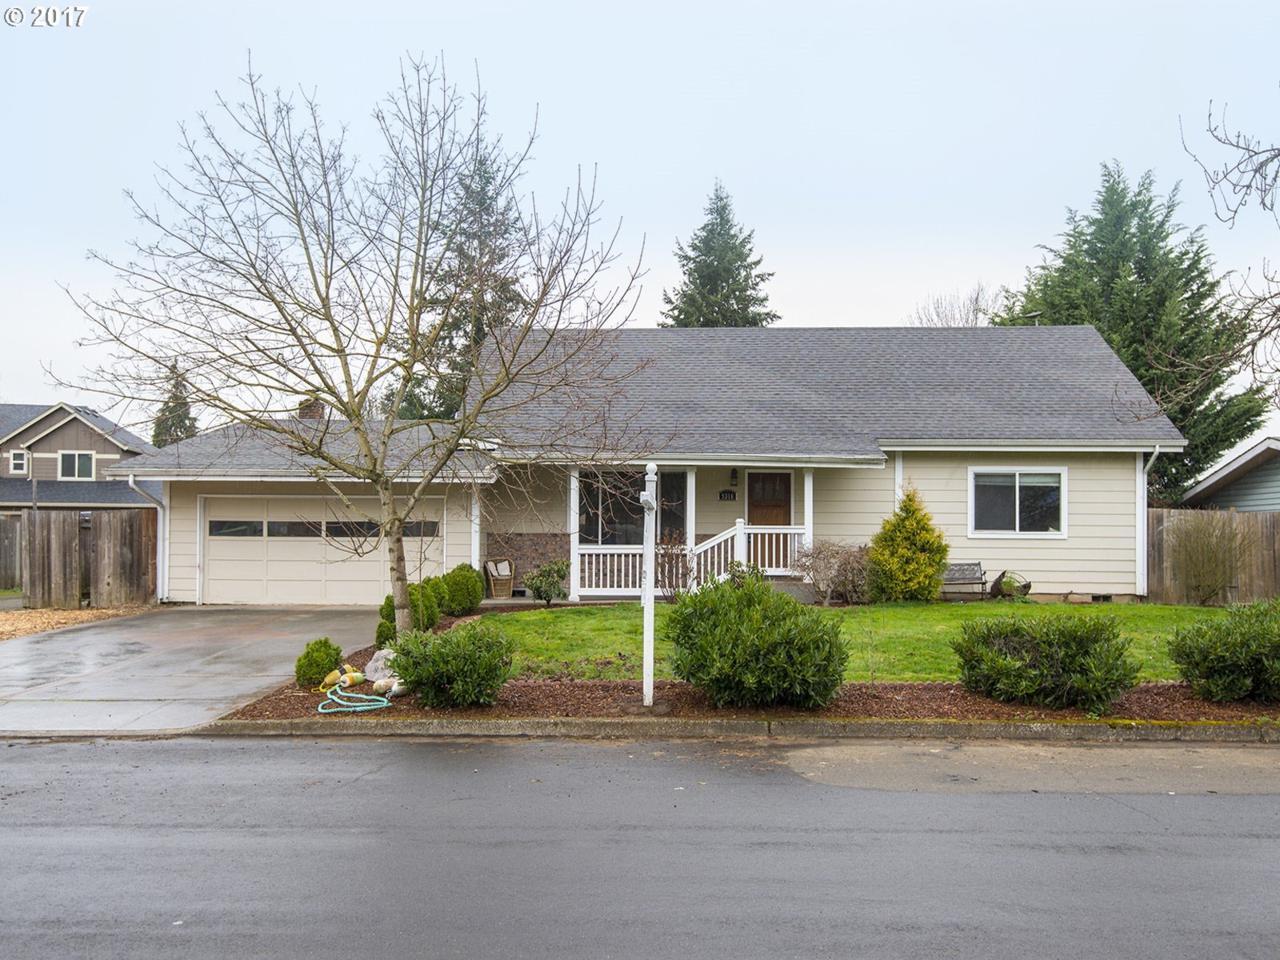 9316 NE 73RD St, Vancouver, WA 98662 (MLS #17275312) :: Portland Real Estate Group